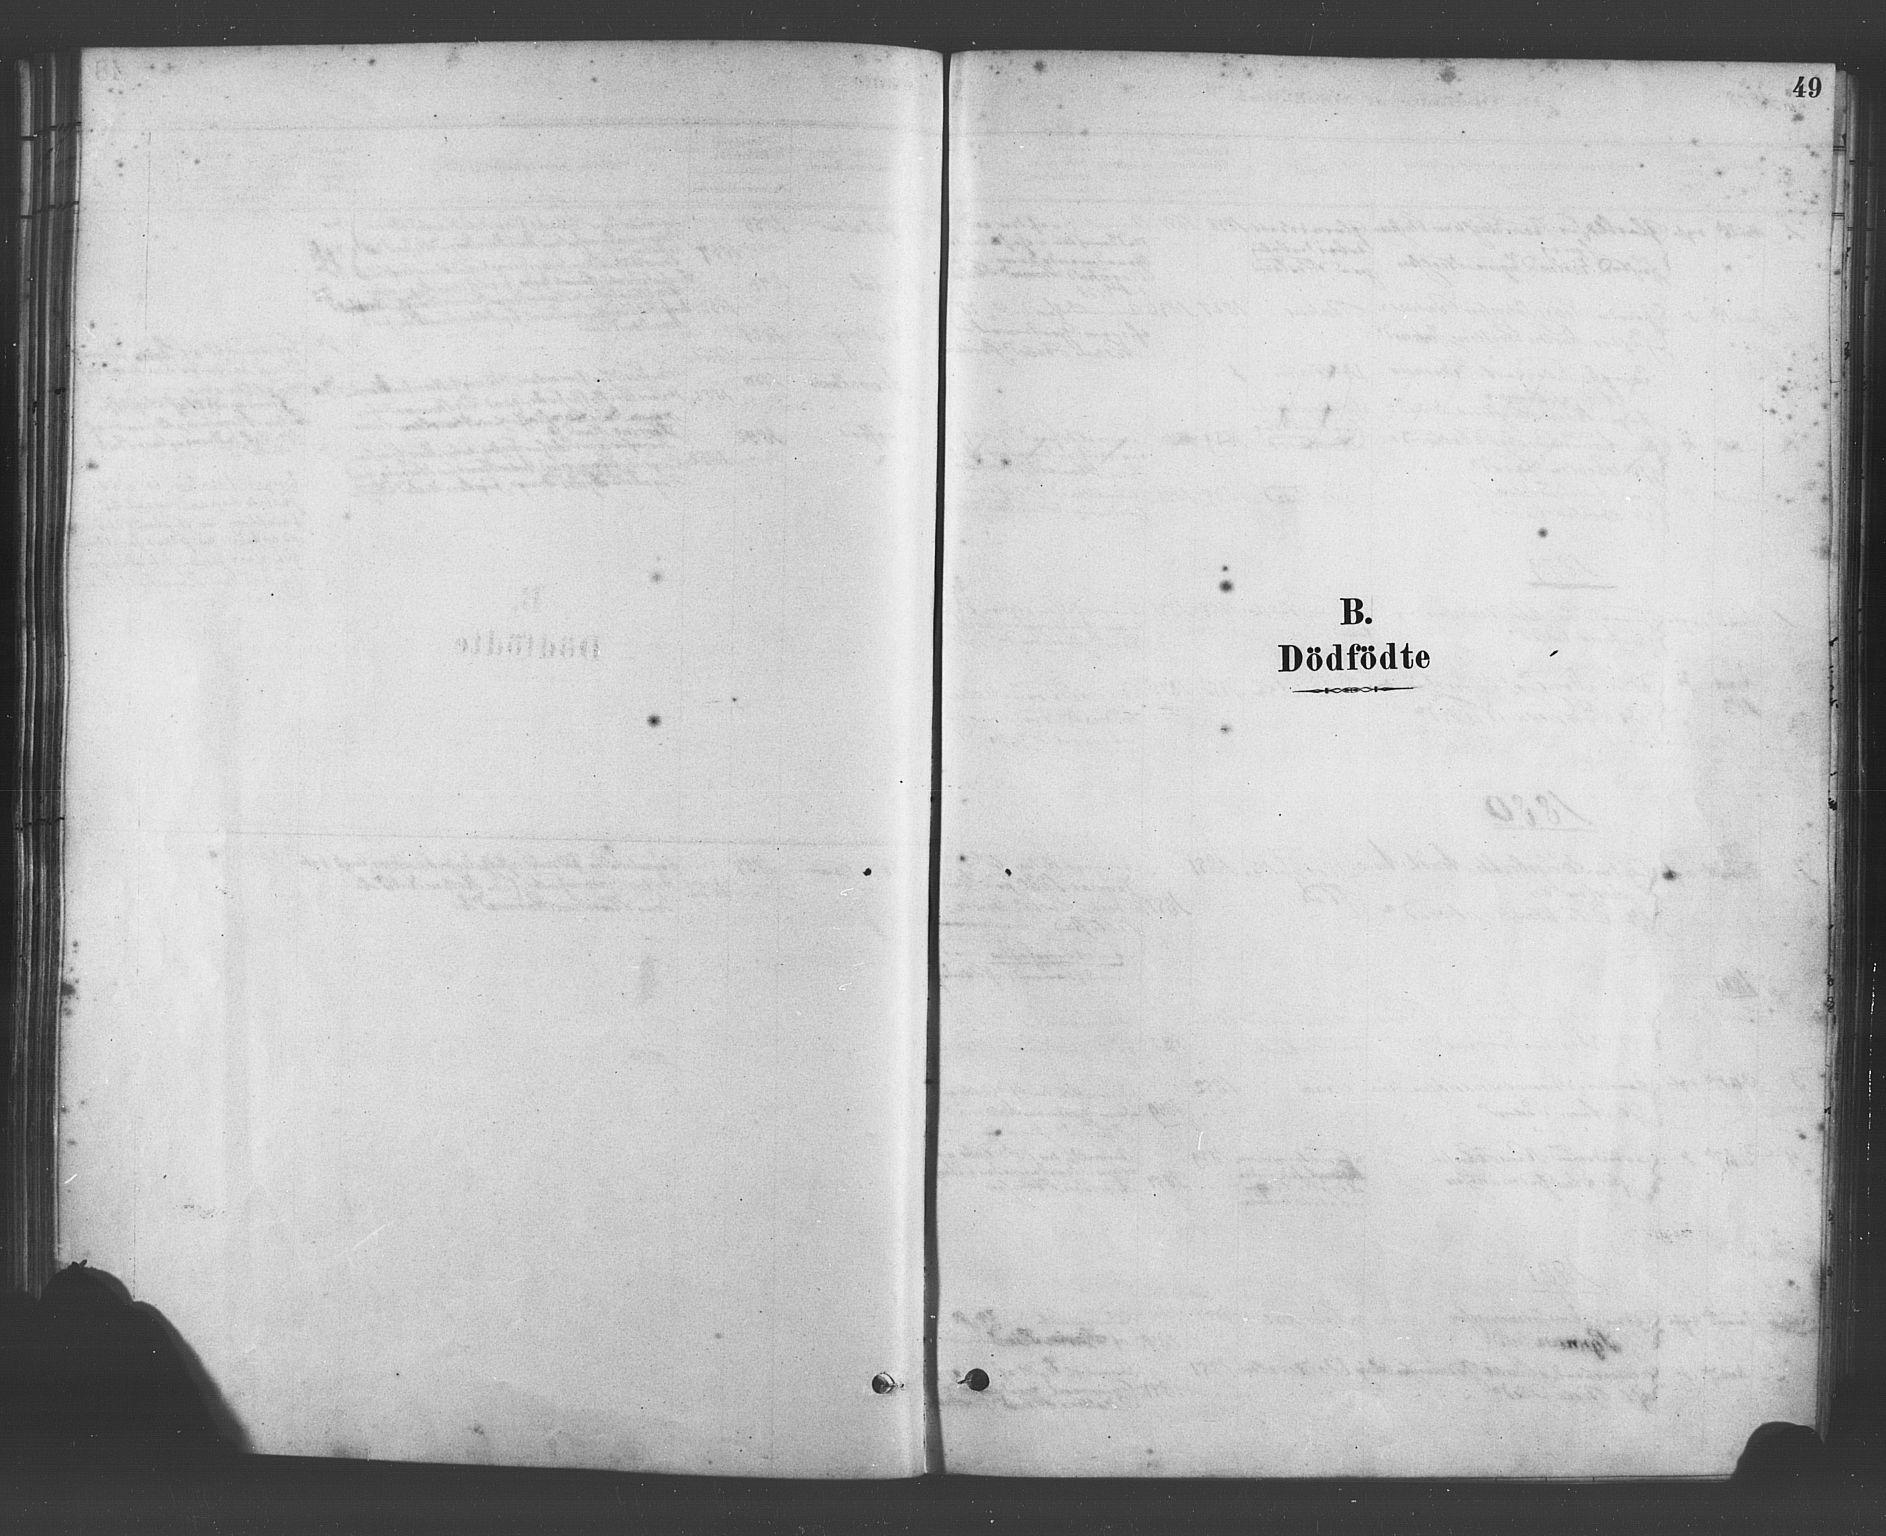 SAB, Fana Sokneprestembete, H/Haa/Haab/L0001: Ministerialbok nr. B 1, 1878-1889, s. 49